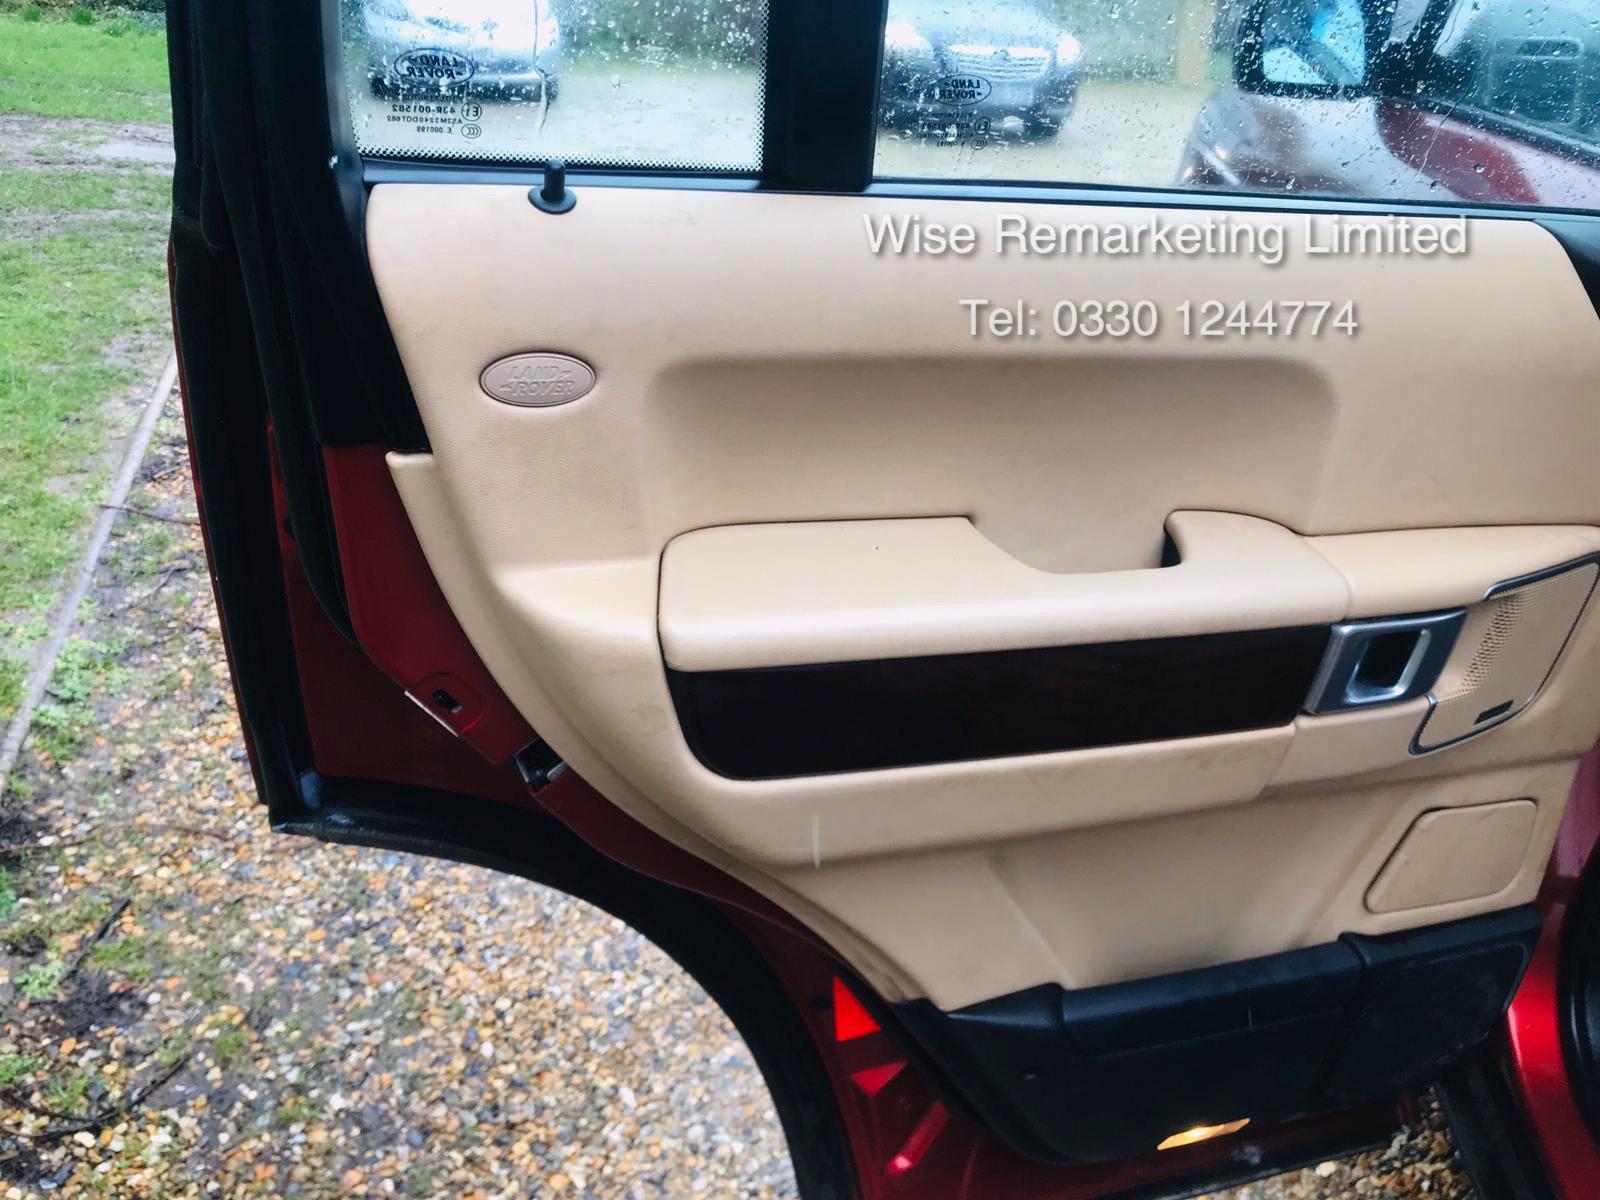 Range Rover Vogue 3.6 TDV8 HSE Auto - 2010 Model - Cream Leather - Service History - - Image 27 of 28